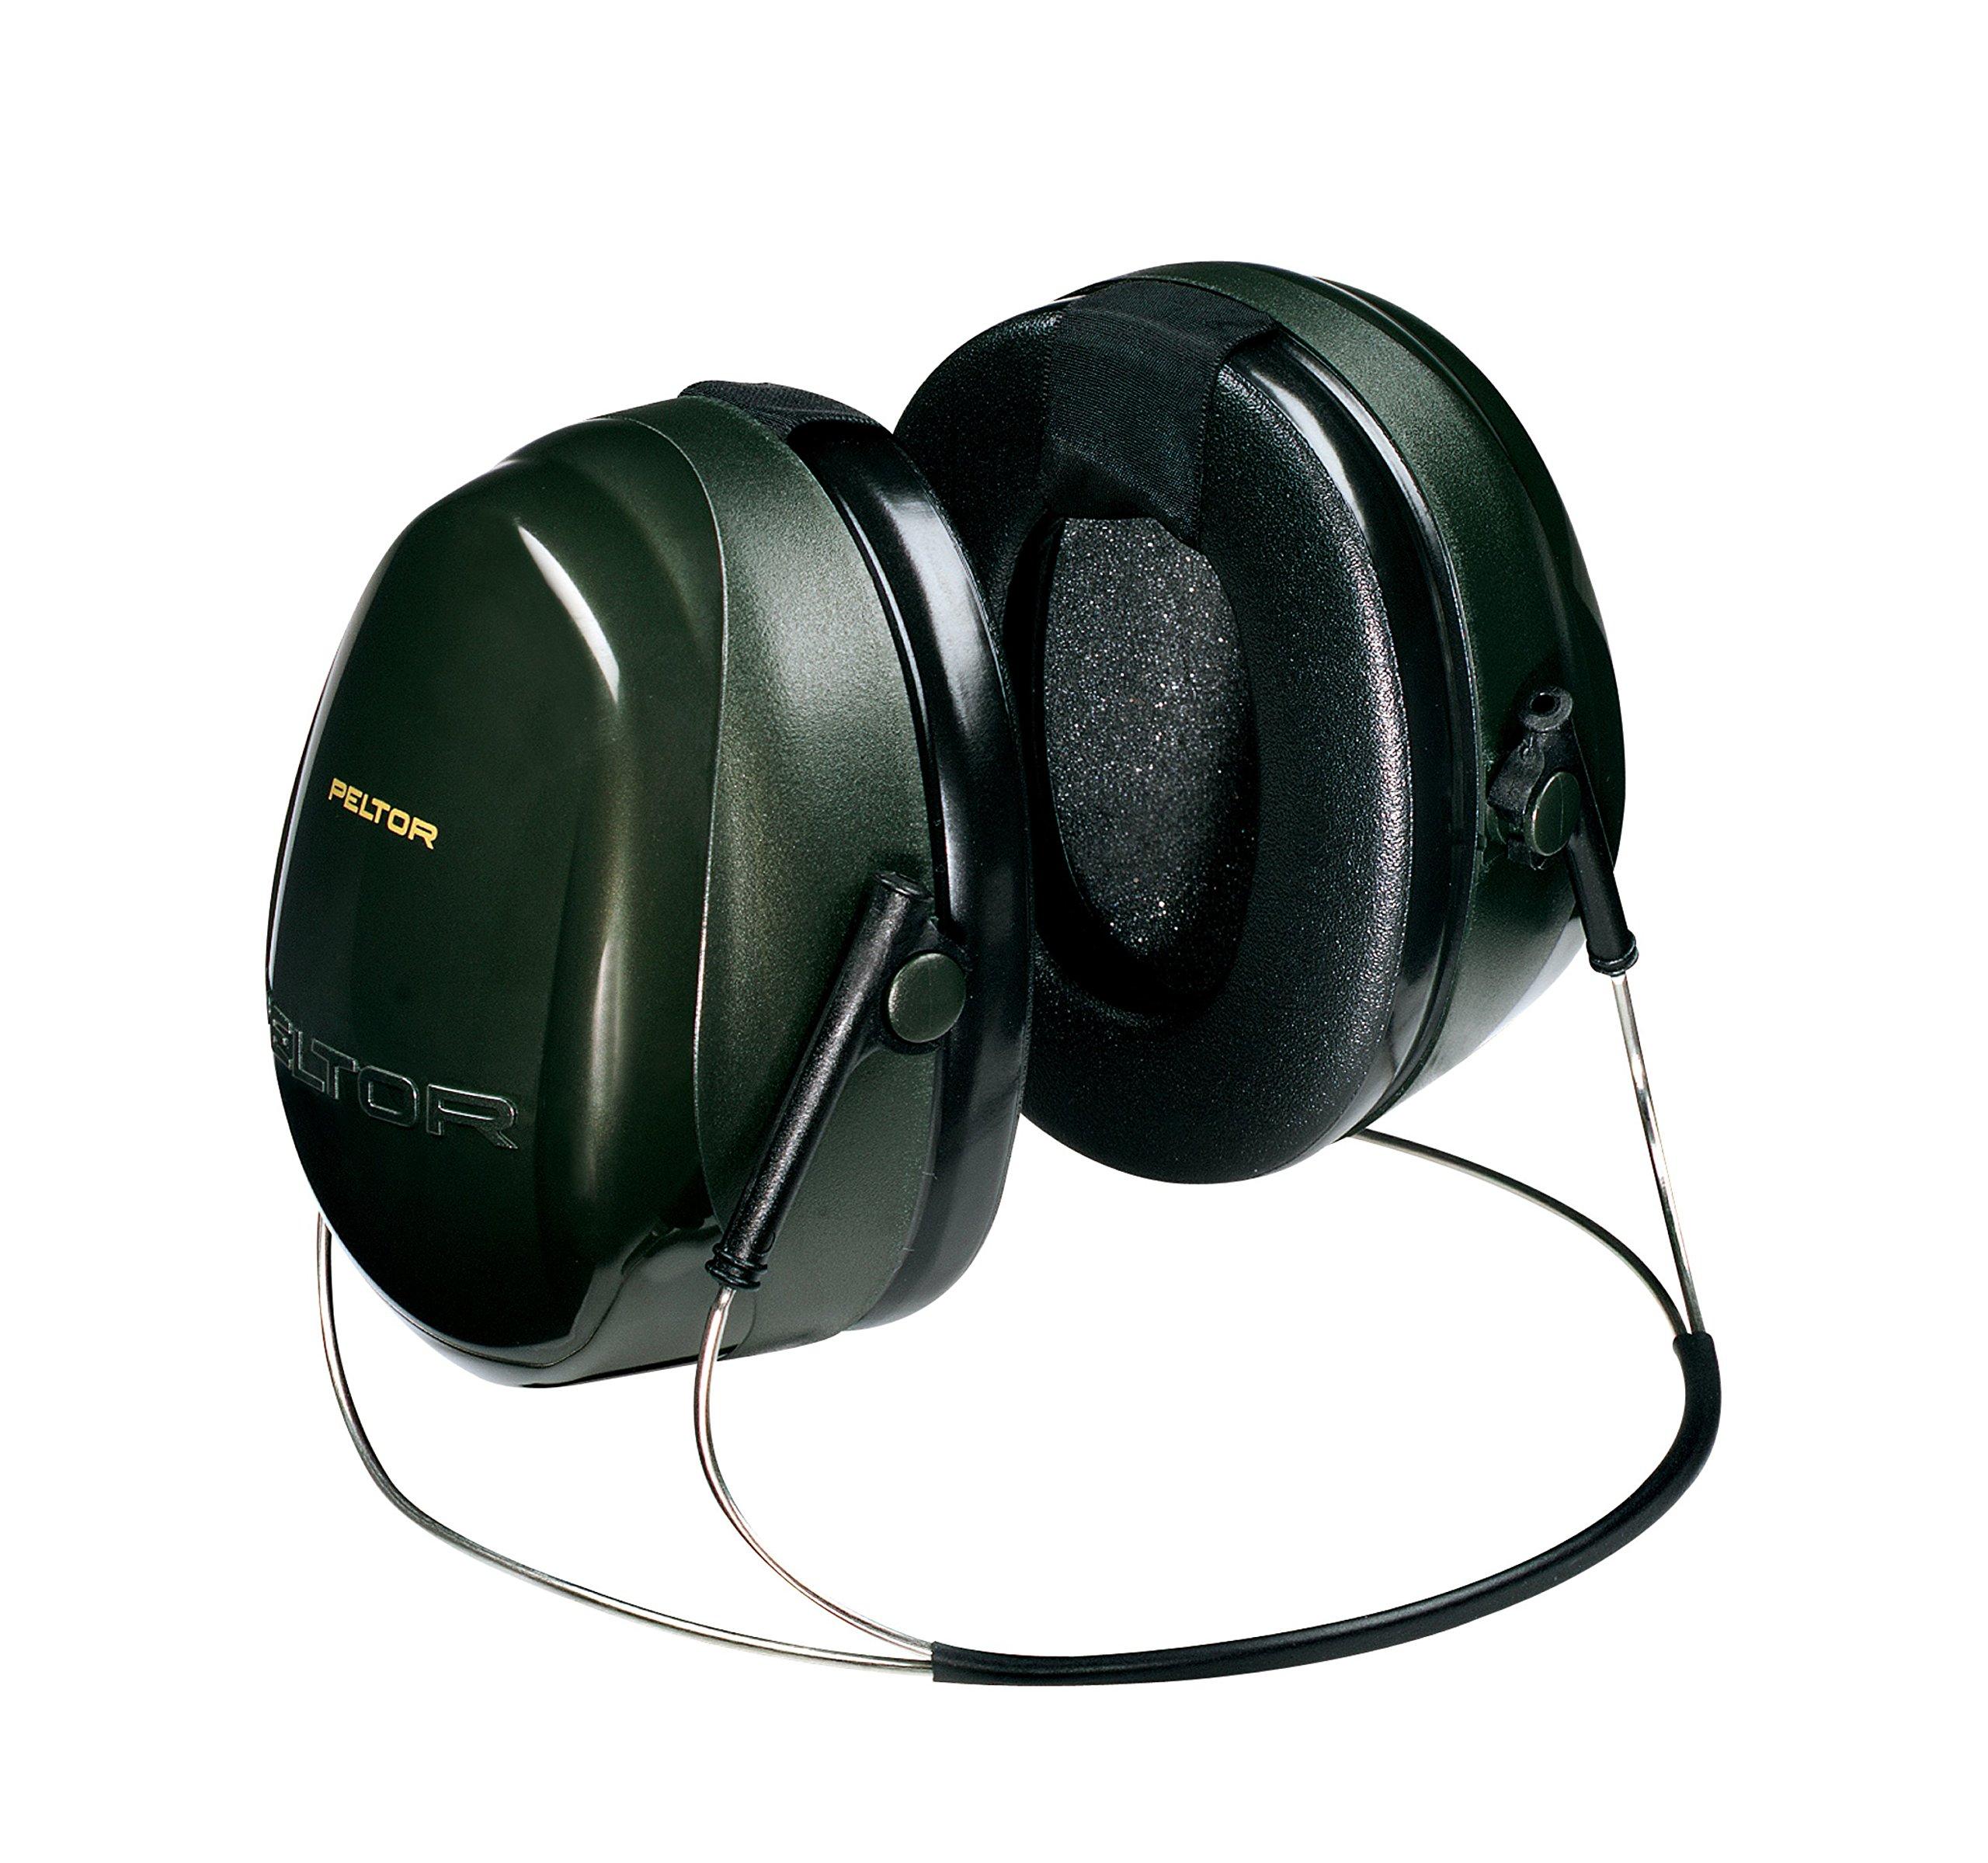 3M Peltor Optime 101 Behind-the-Head Earmuff, Hearing Protection, Ear Protectors, NRR 26 dB